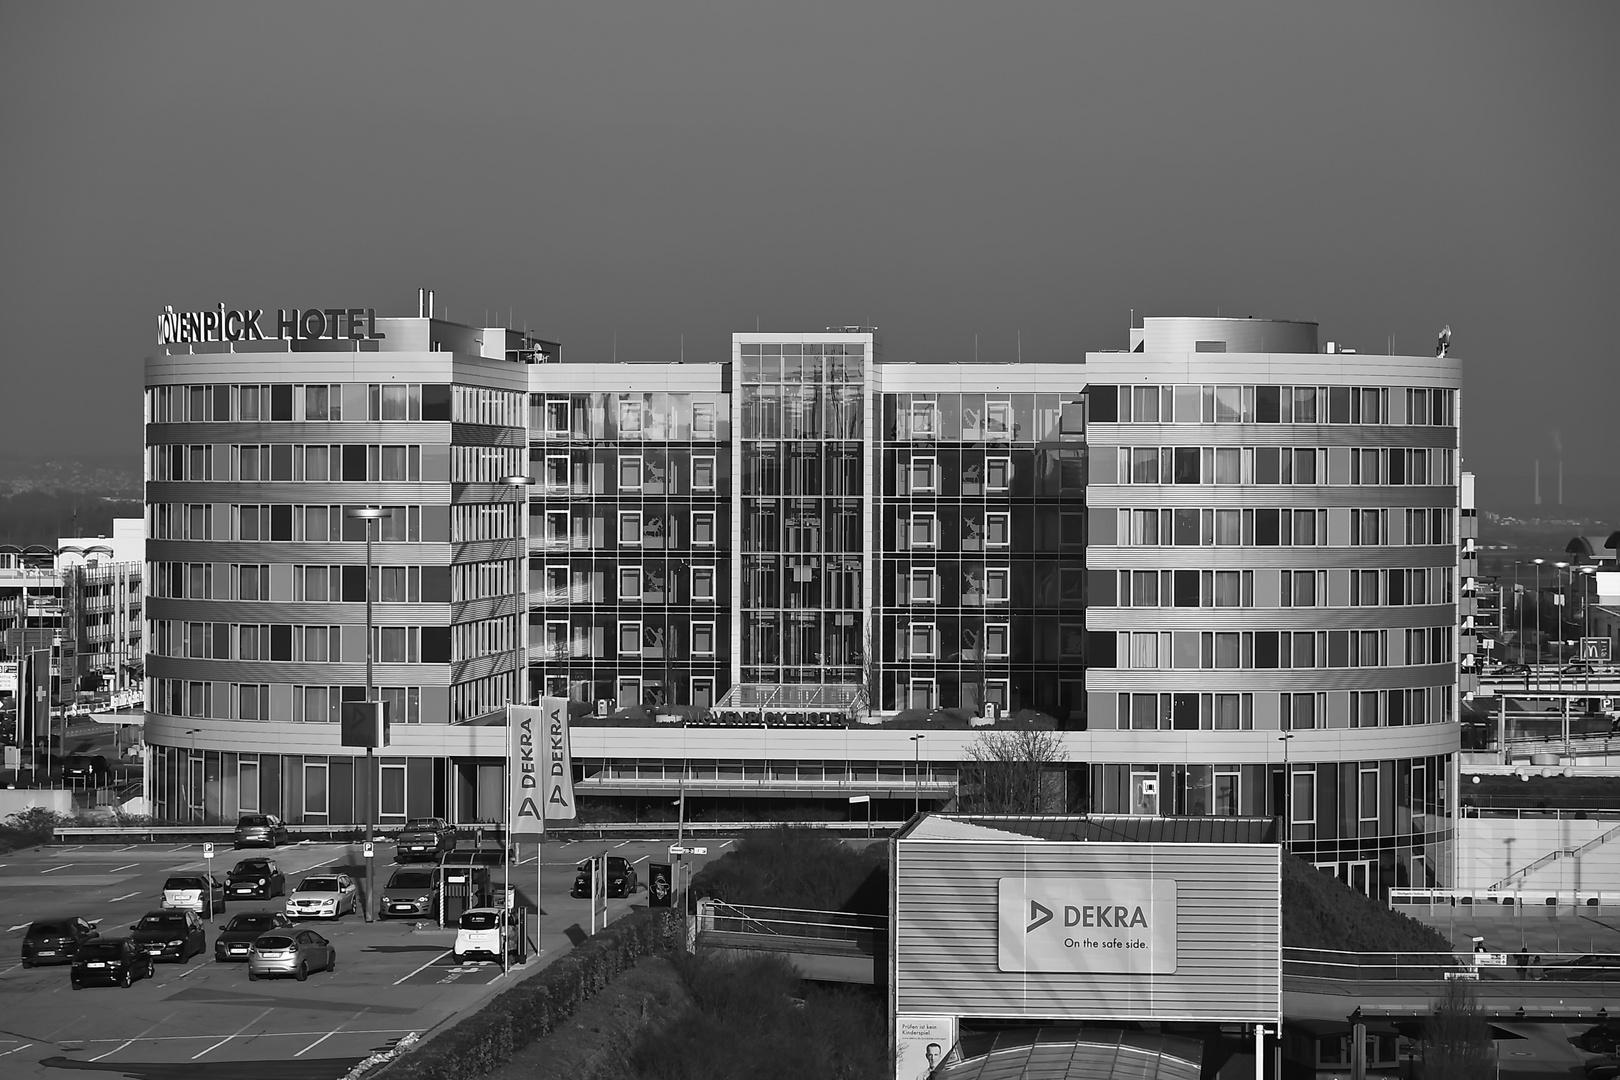 Mövenpick Hotel Airport Stuttgart